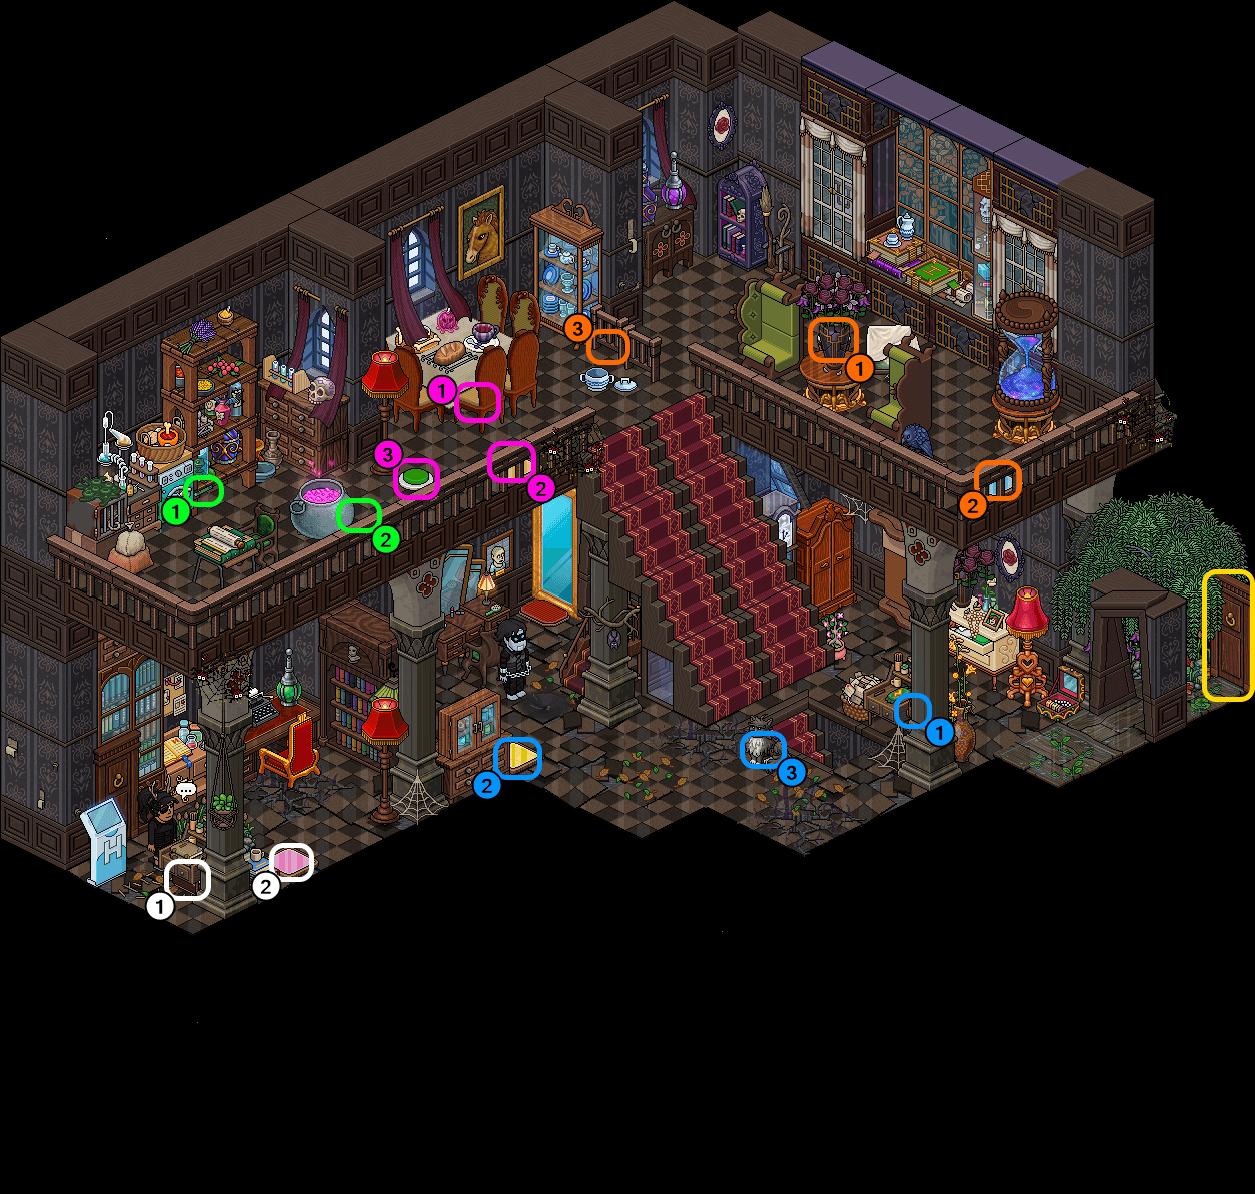 [HIH] Maison Impossible - Hall